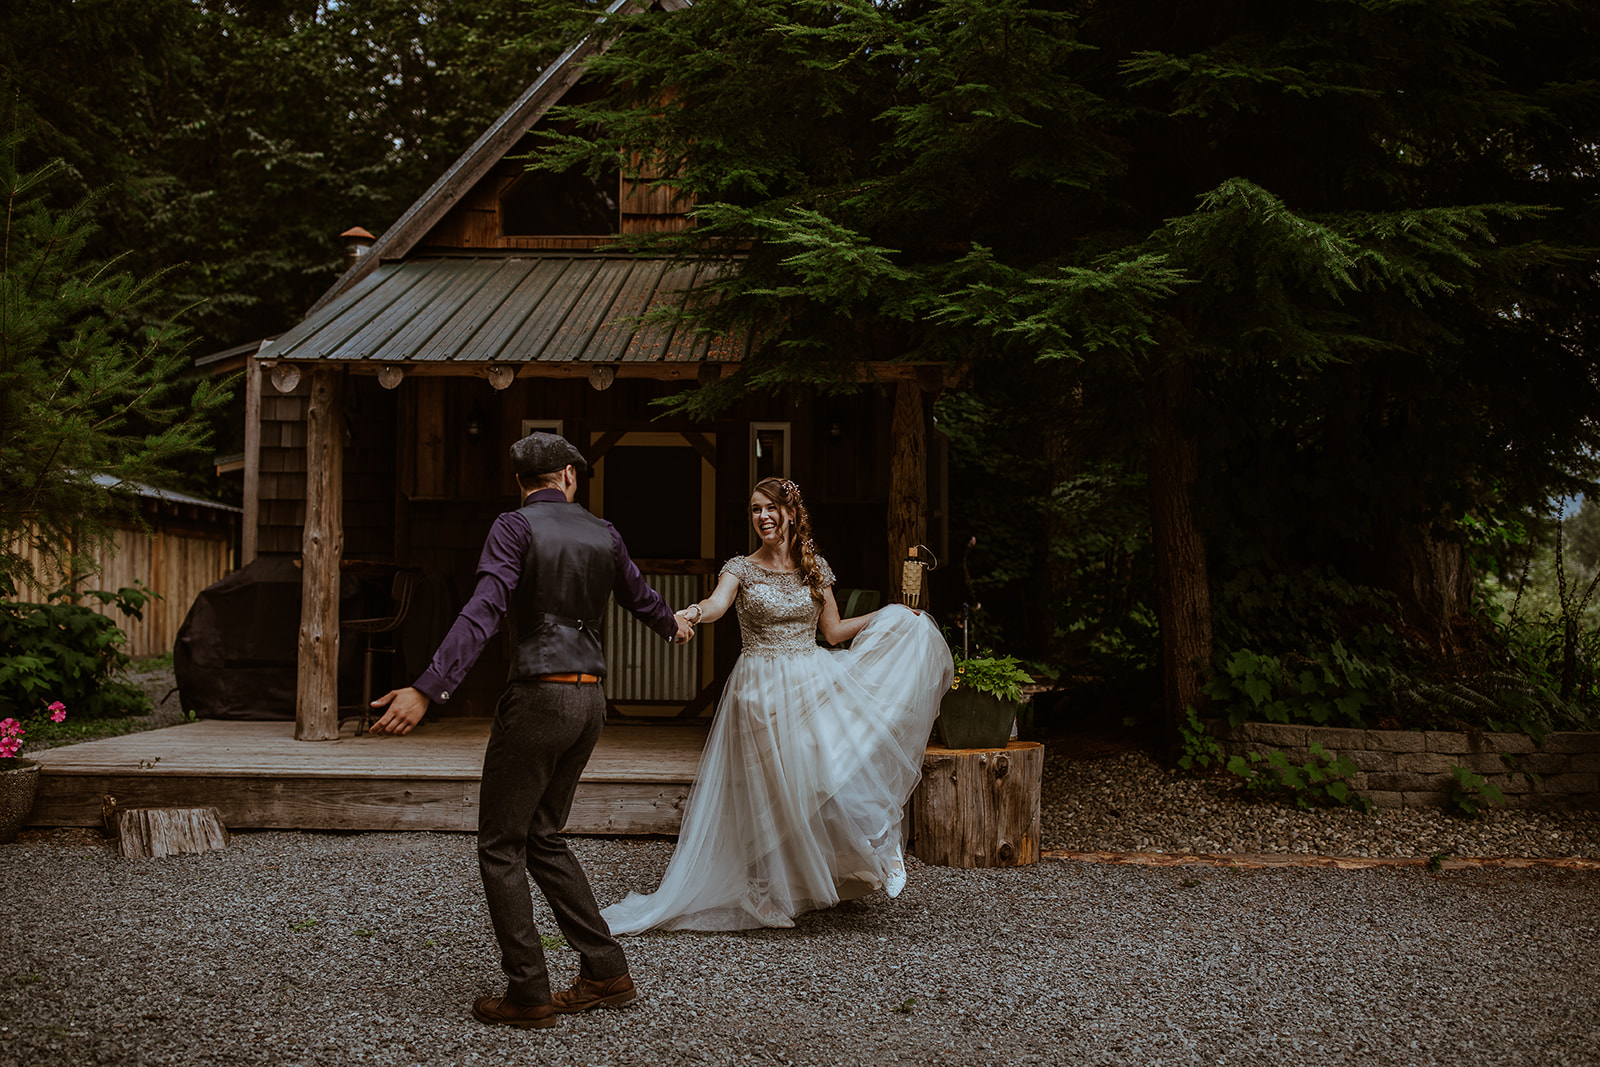 mount-rainier-cabin-elopement-megan-gallagher-photography_(138_of_568).jpg